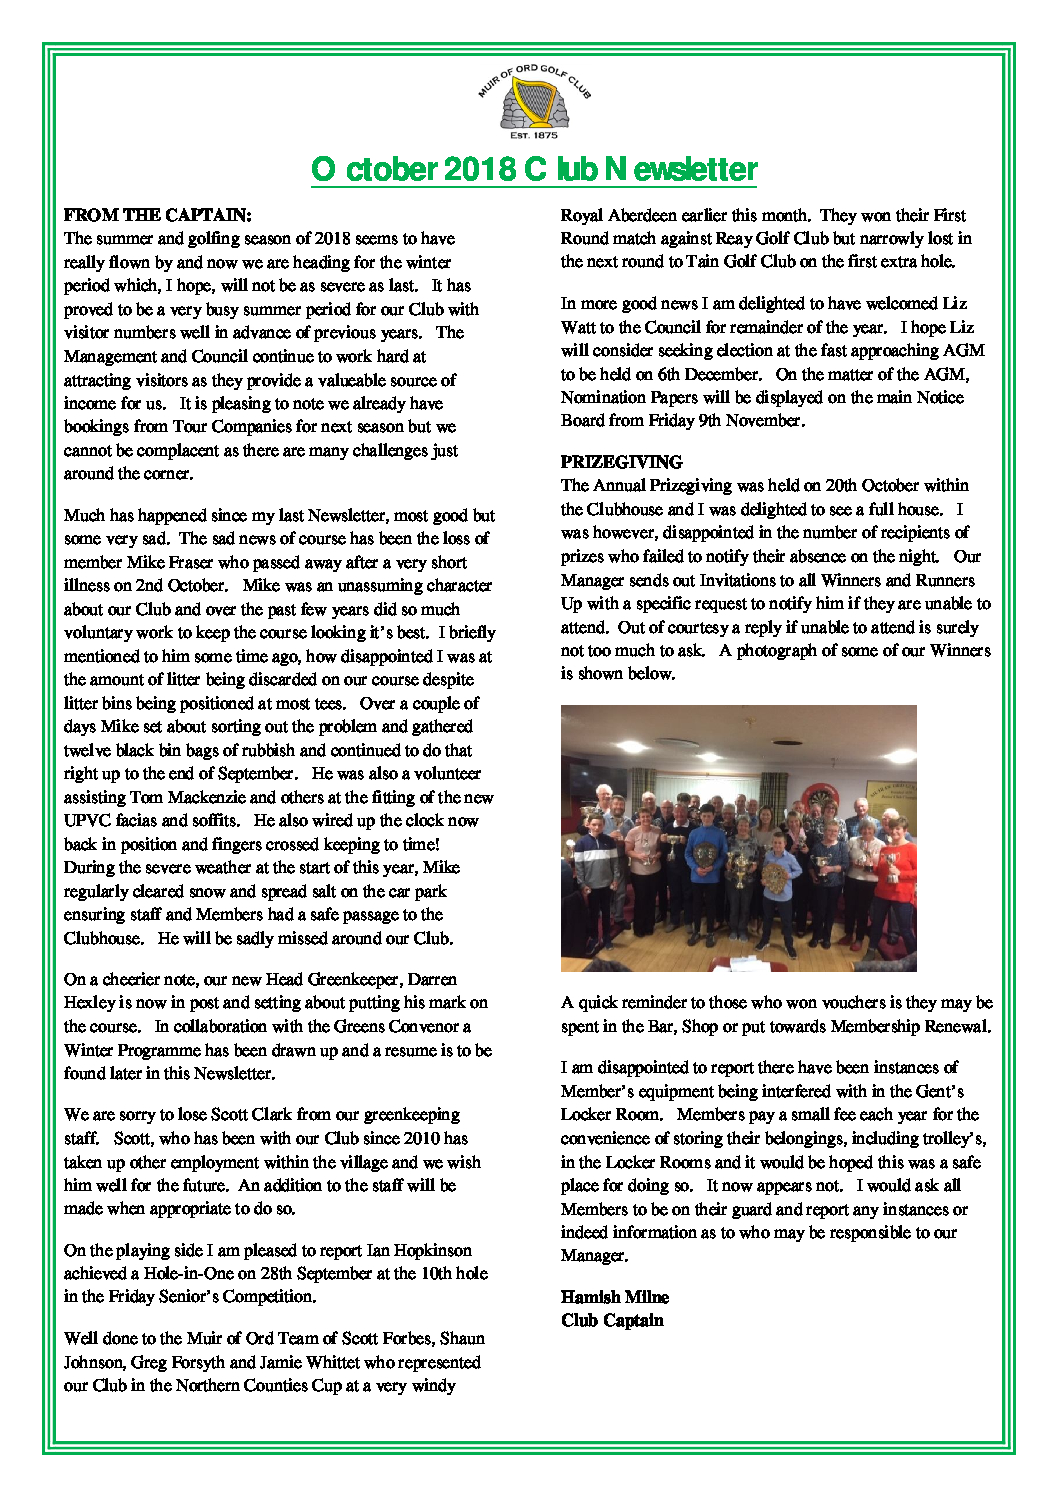 Muir of Ord Golf Club October 2018 Newsletter